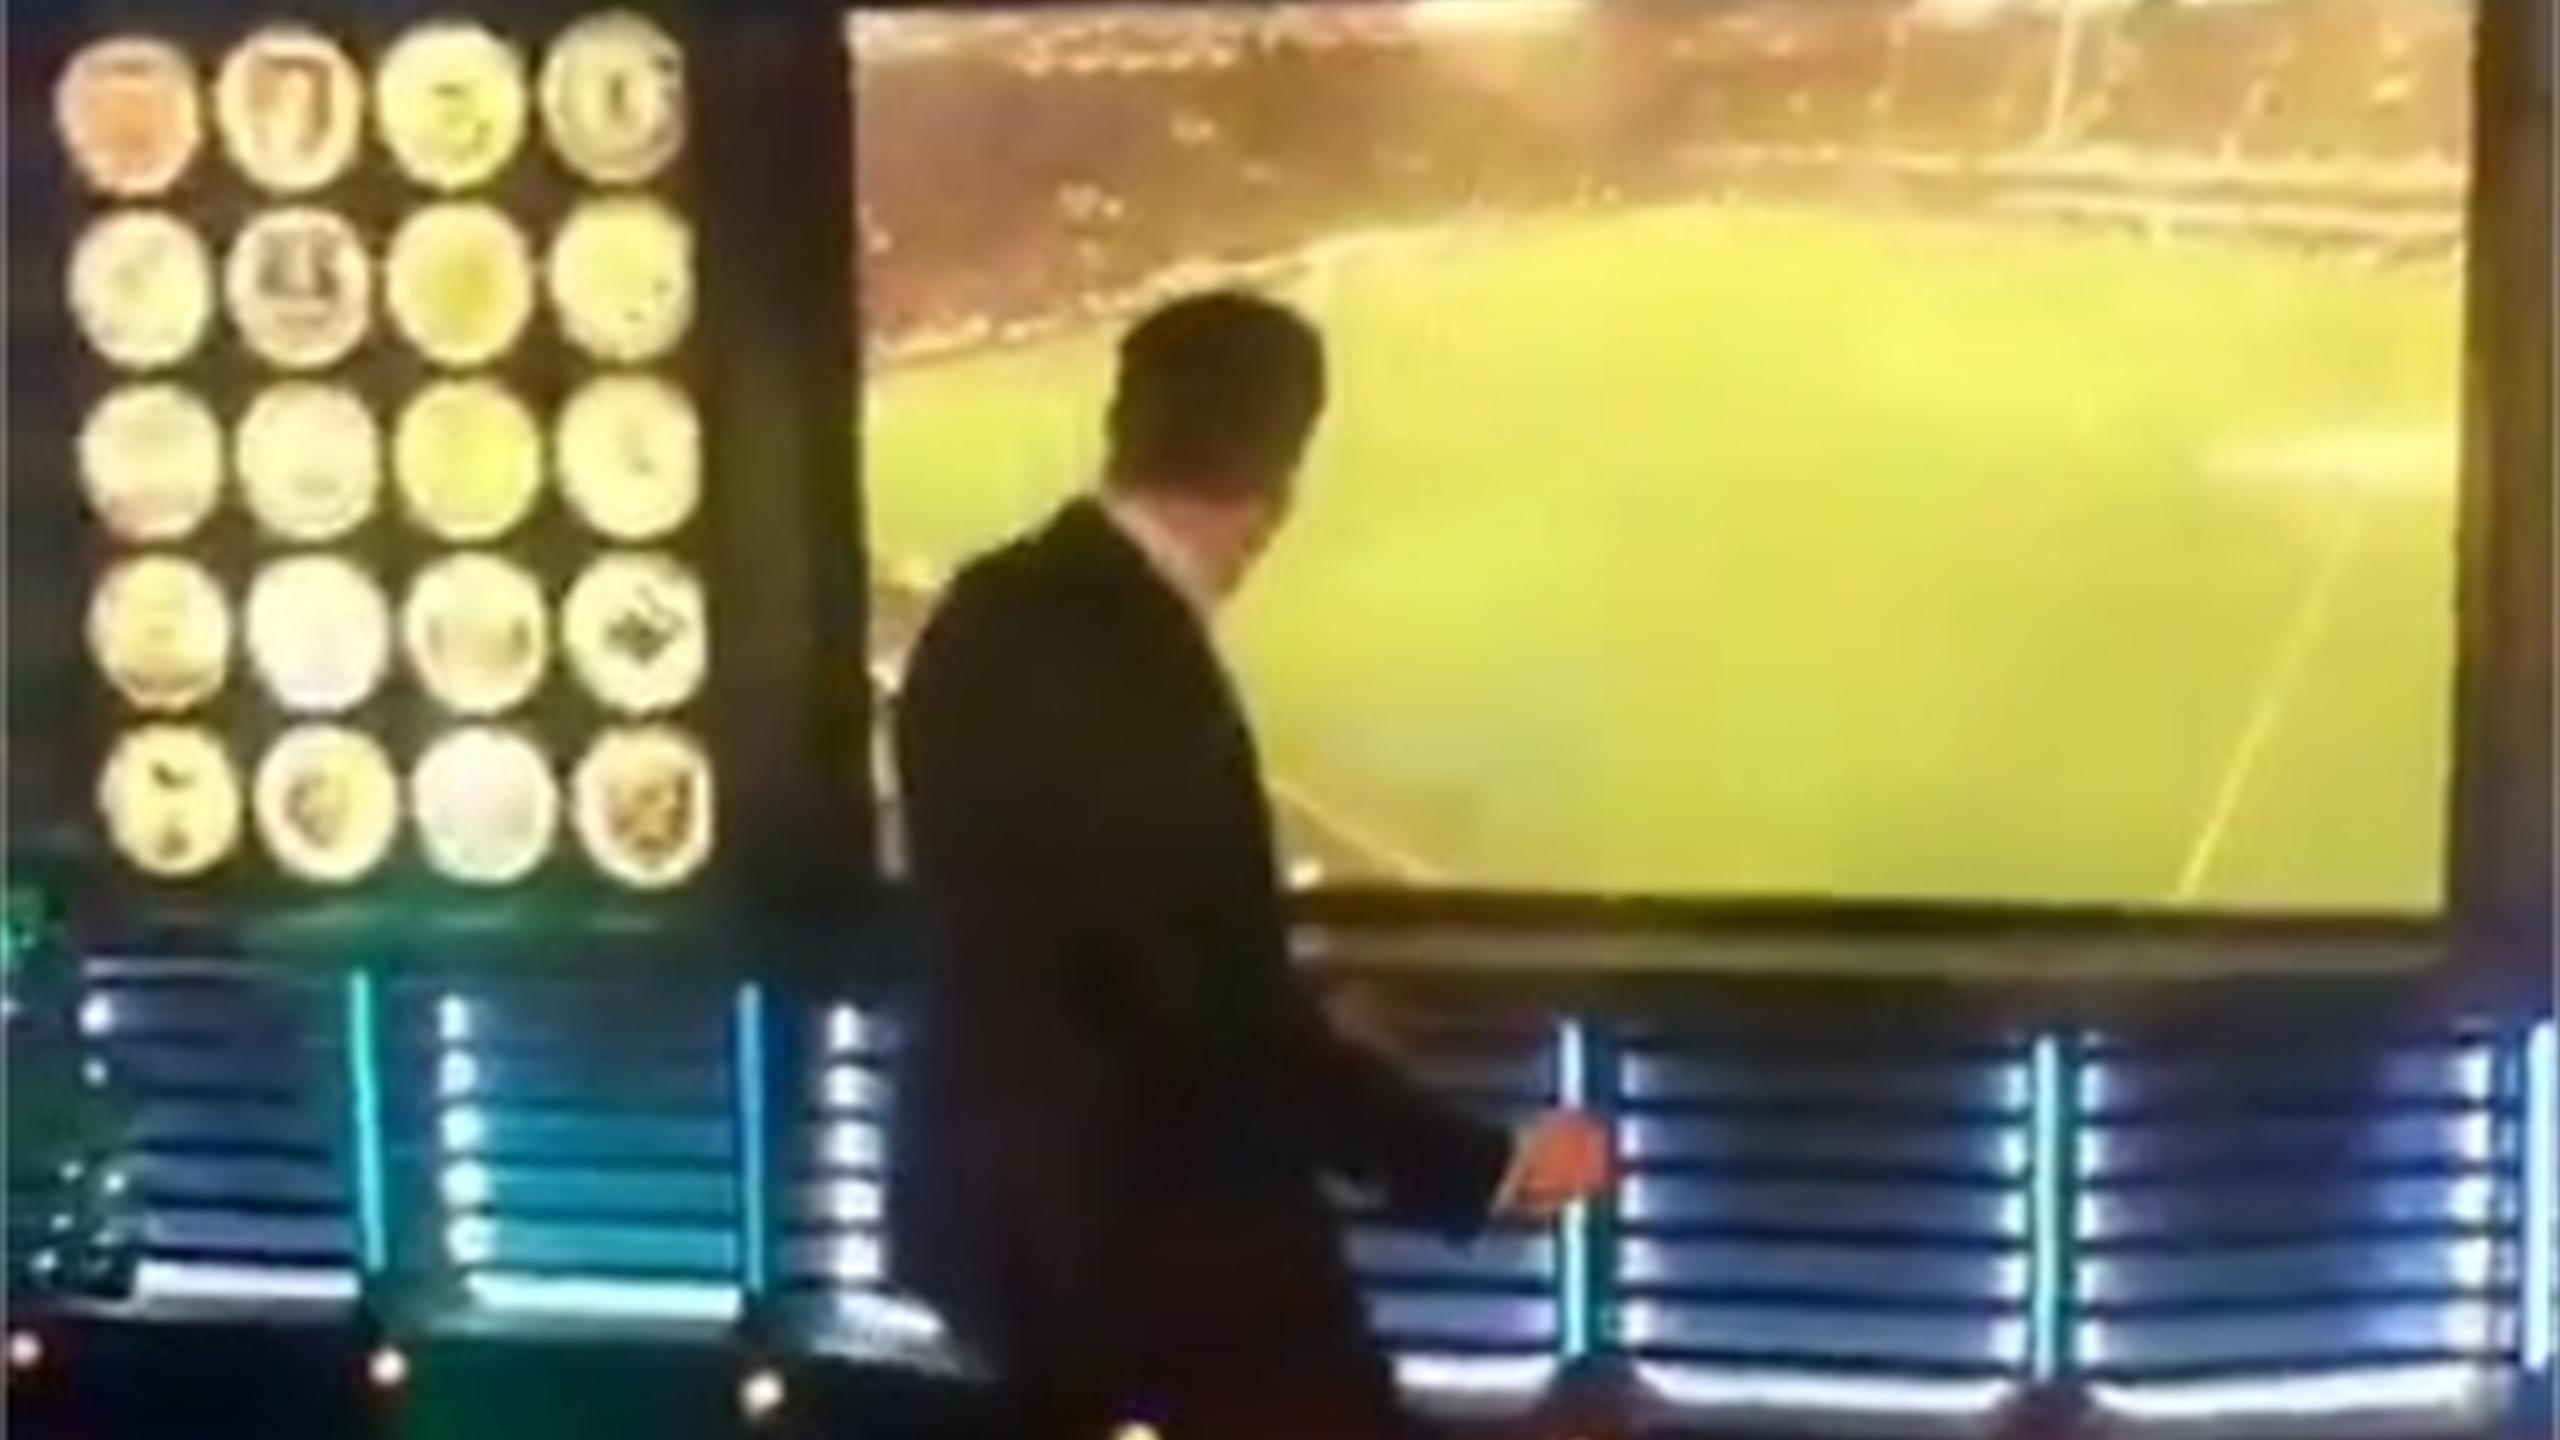 Liverpool legend Jamie Carragher's brilliant celebration after Merseyside derby winner (Soccer AM on Twitter)